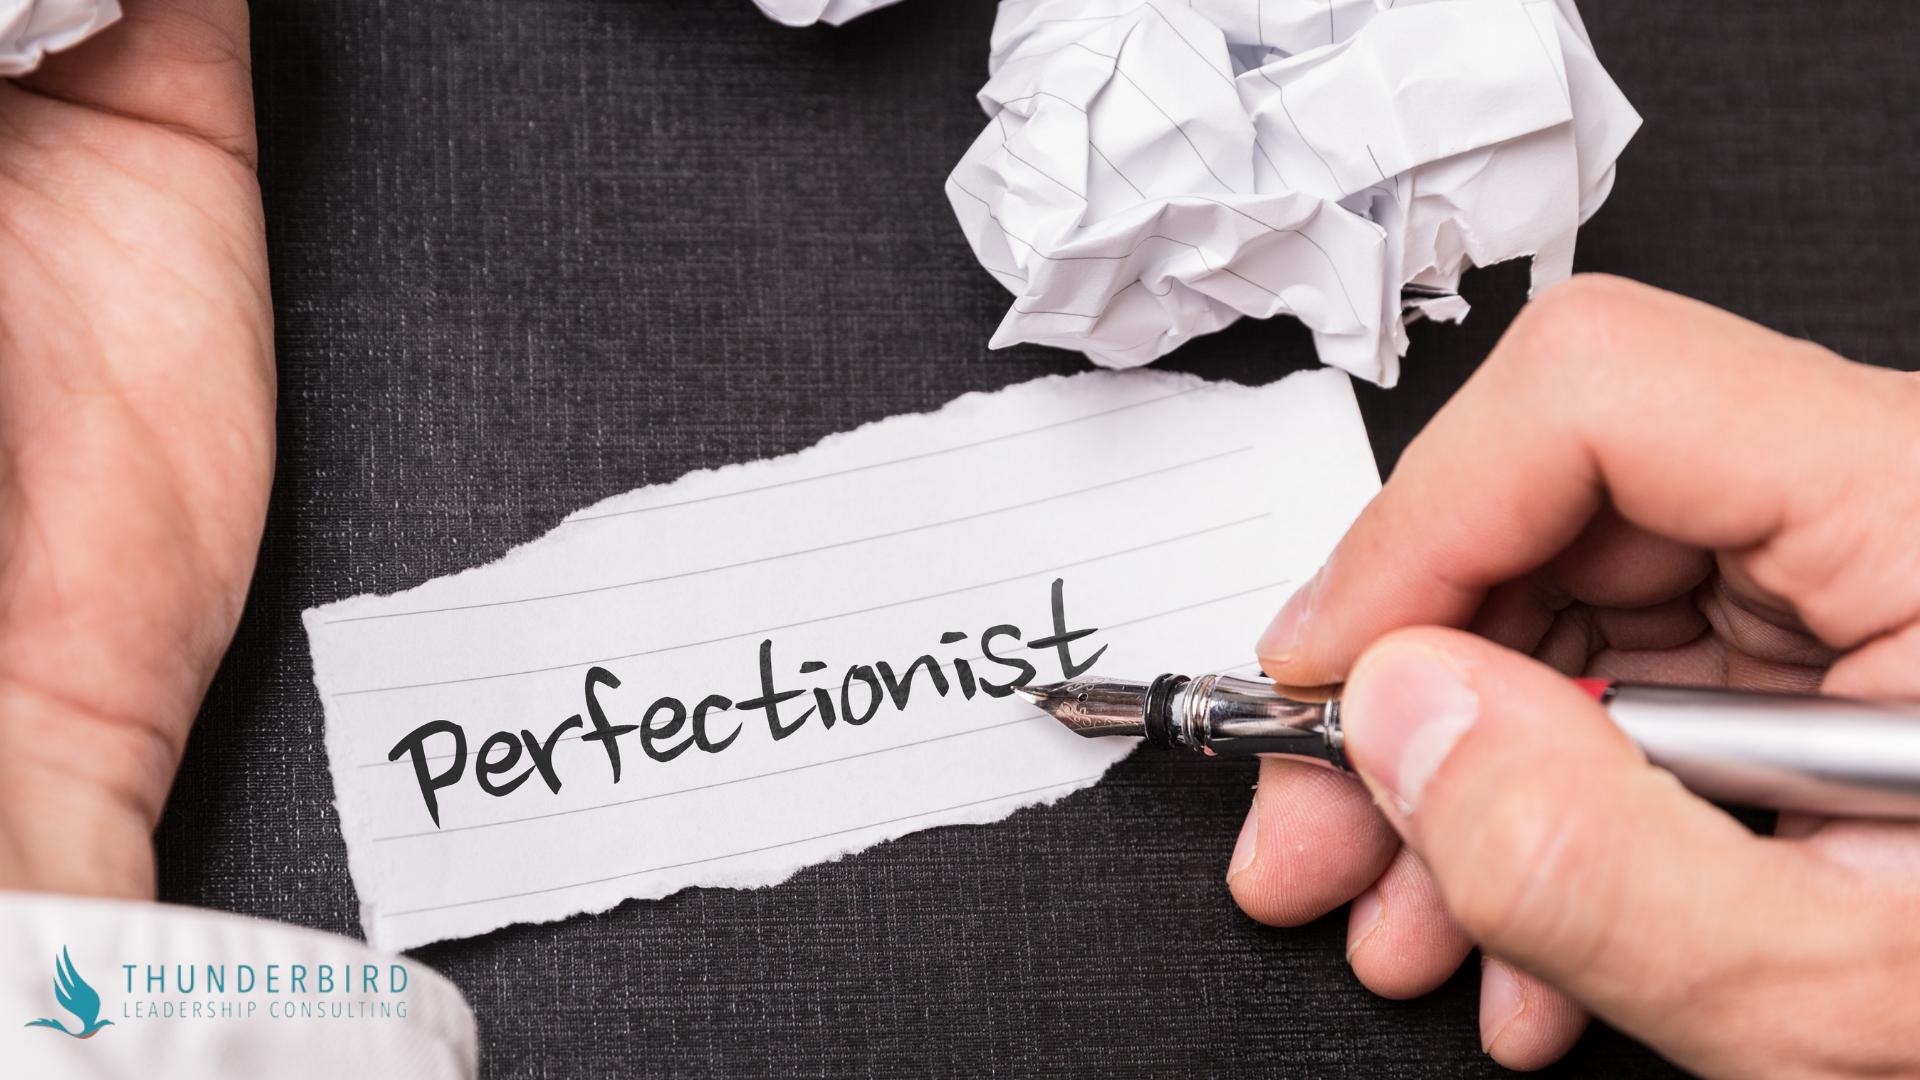 TLC – Blog on Perfectionism